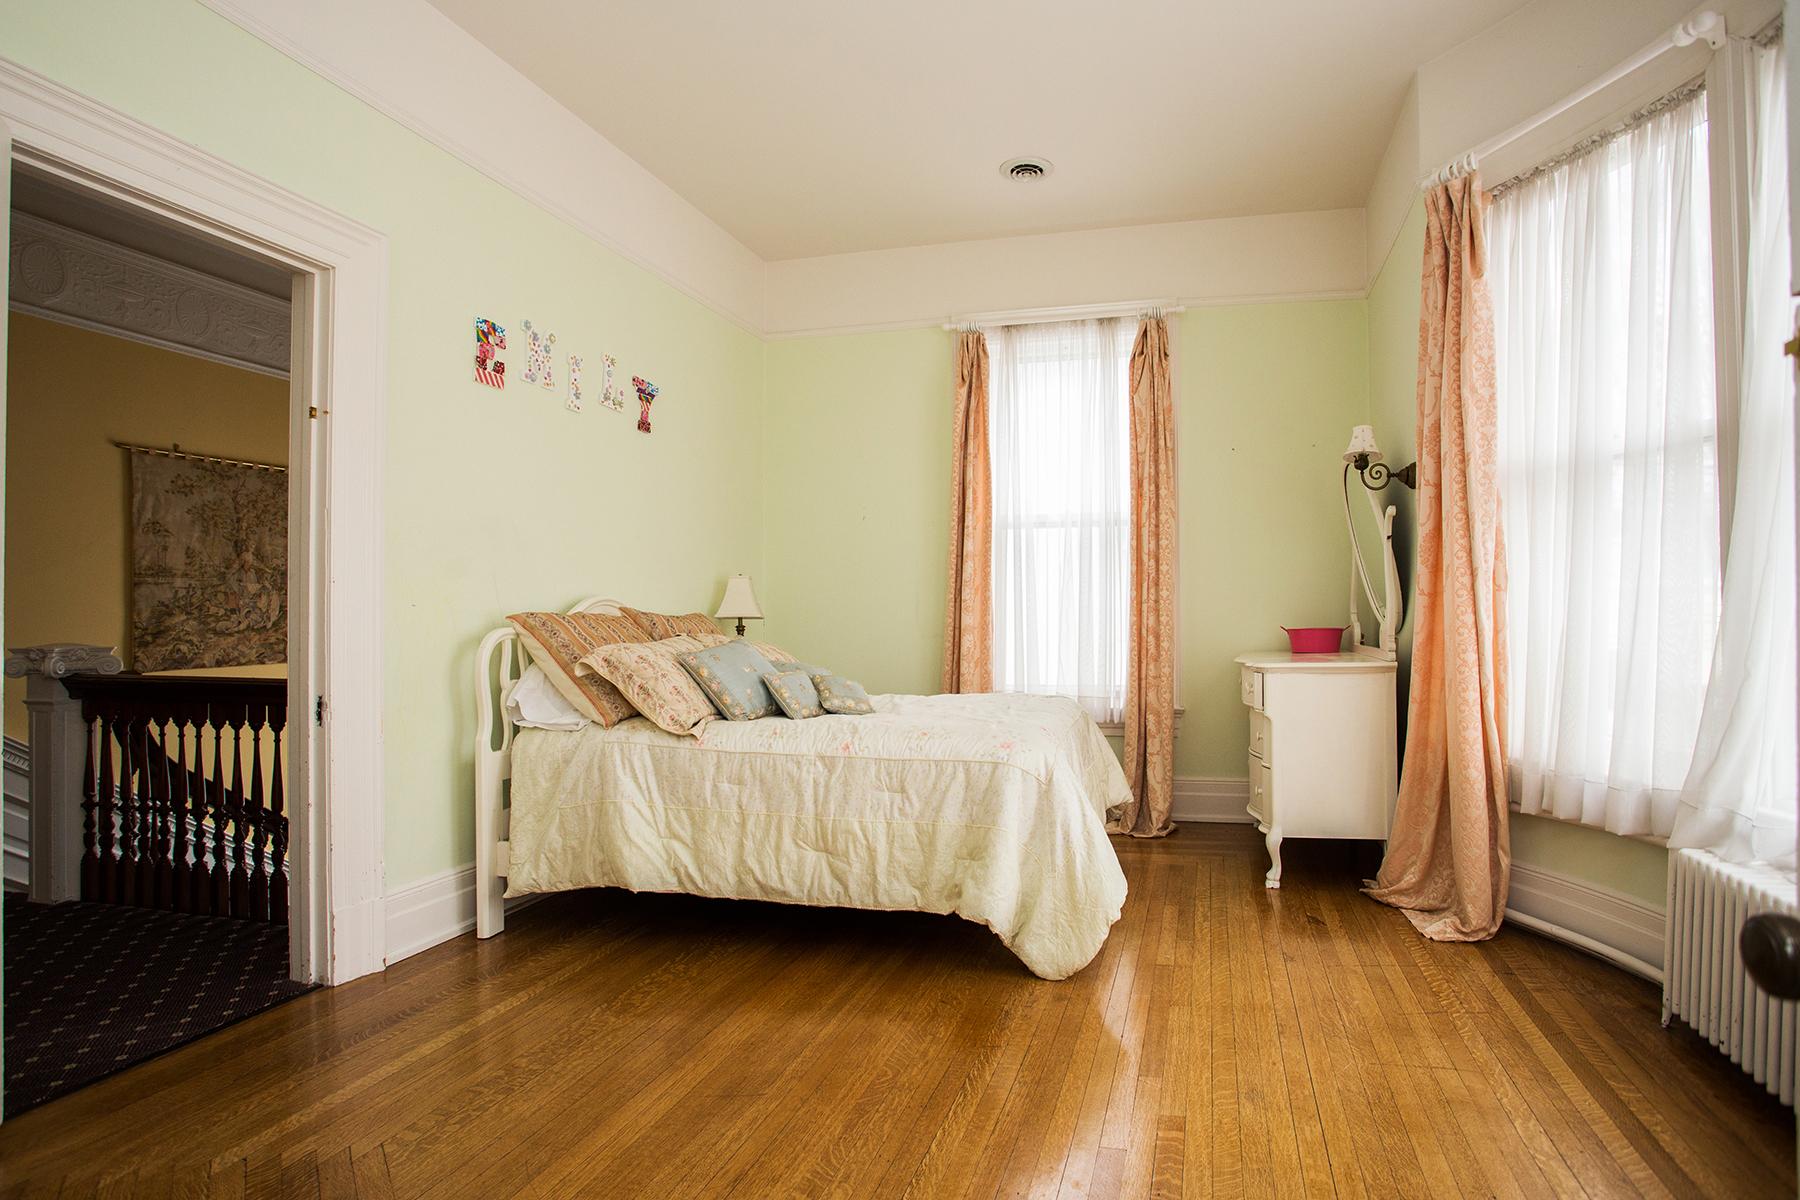 Additional photo for property listing at Downtown Saratoga Victorian Mansion 115  Circular St Saratoga Springs, Нью-Йорк 12866 Соединенные Штаты